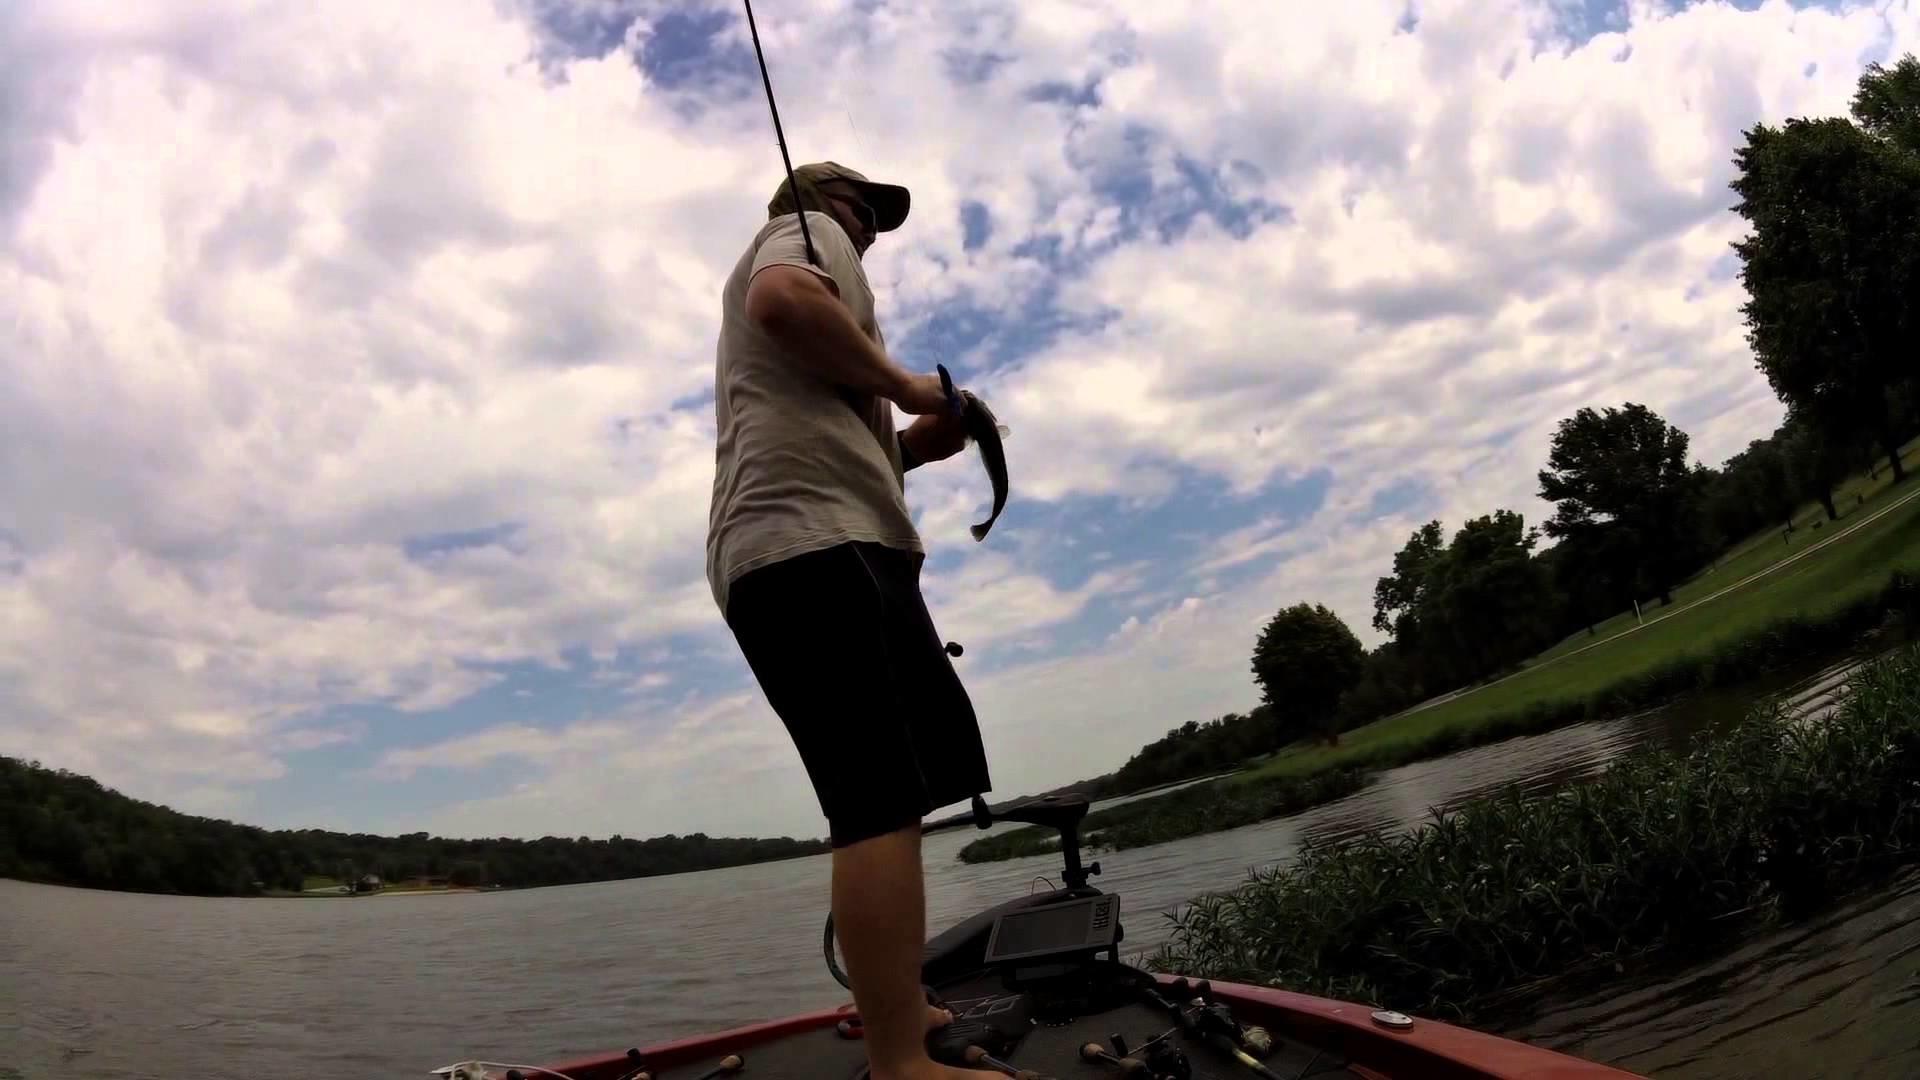 Olathe Lake bass fishing 7/1/15